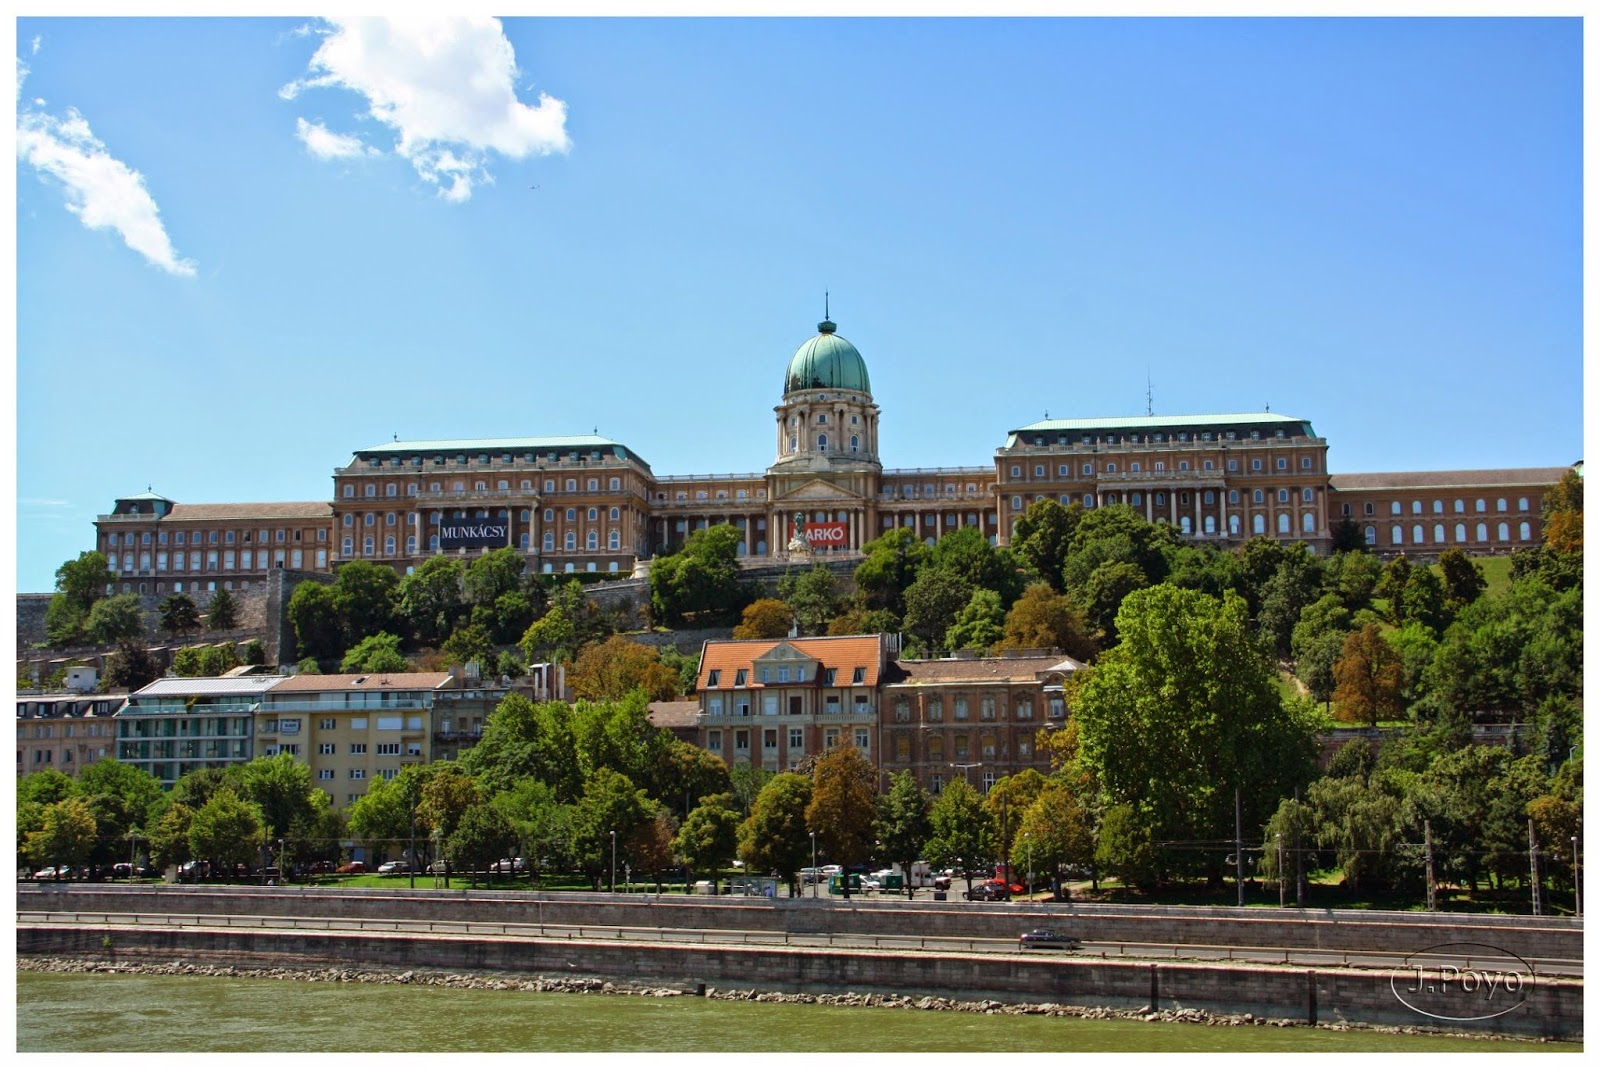 Palacio Real o Castillo de Buda, Budapest